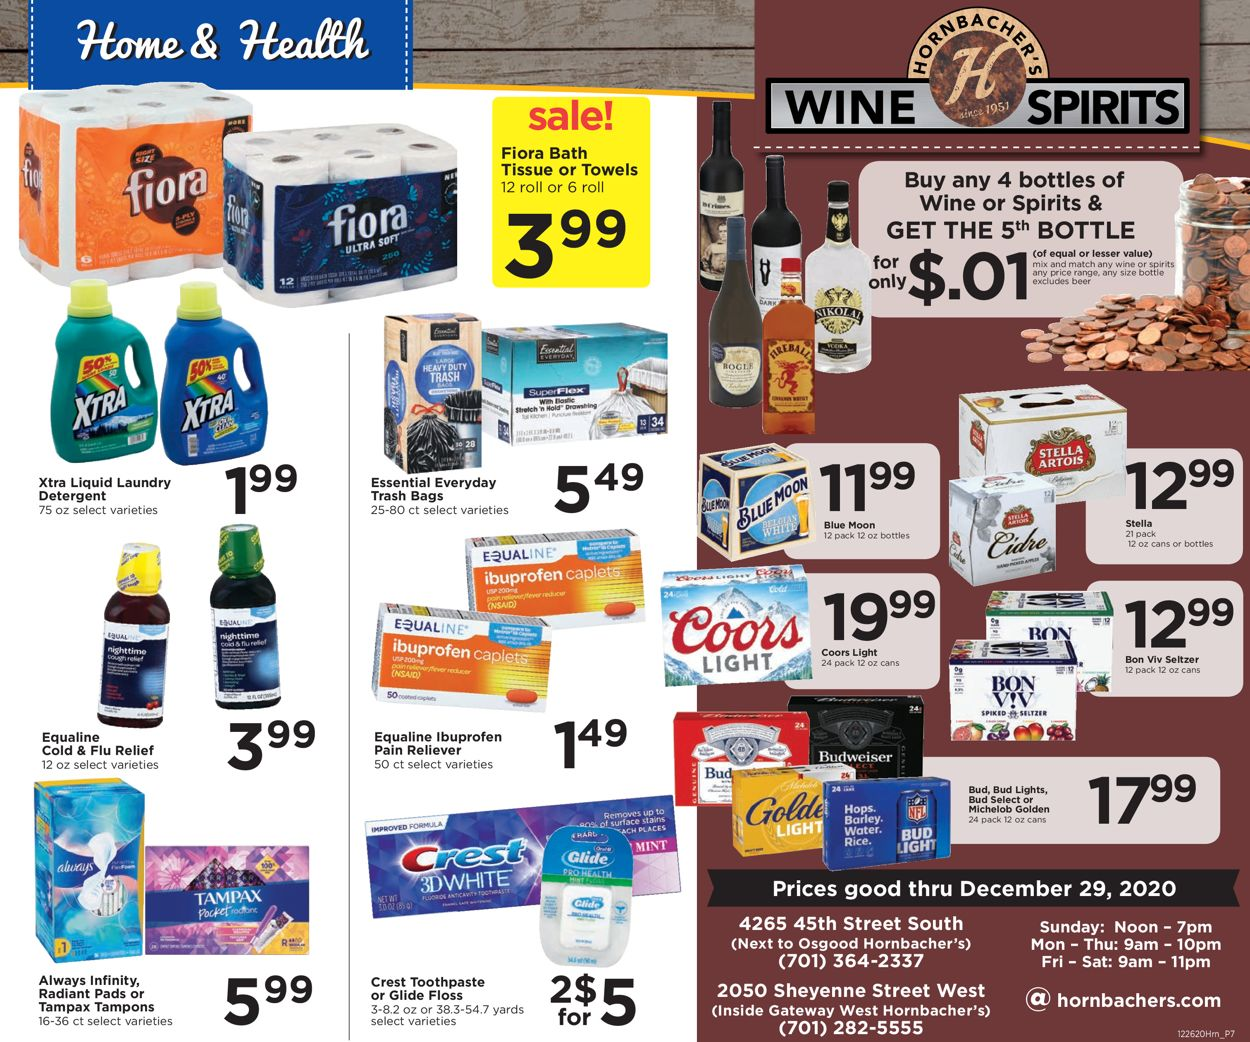 Hornbacher's Wine & Spirits 2020 Weekly Ad Circular - valid 12/22-12/29/2020